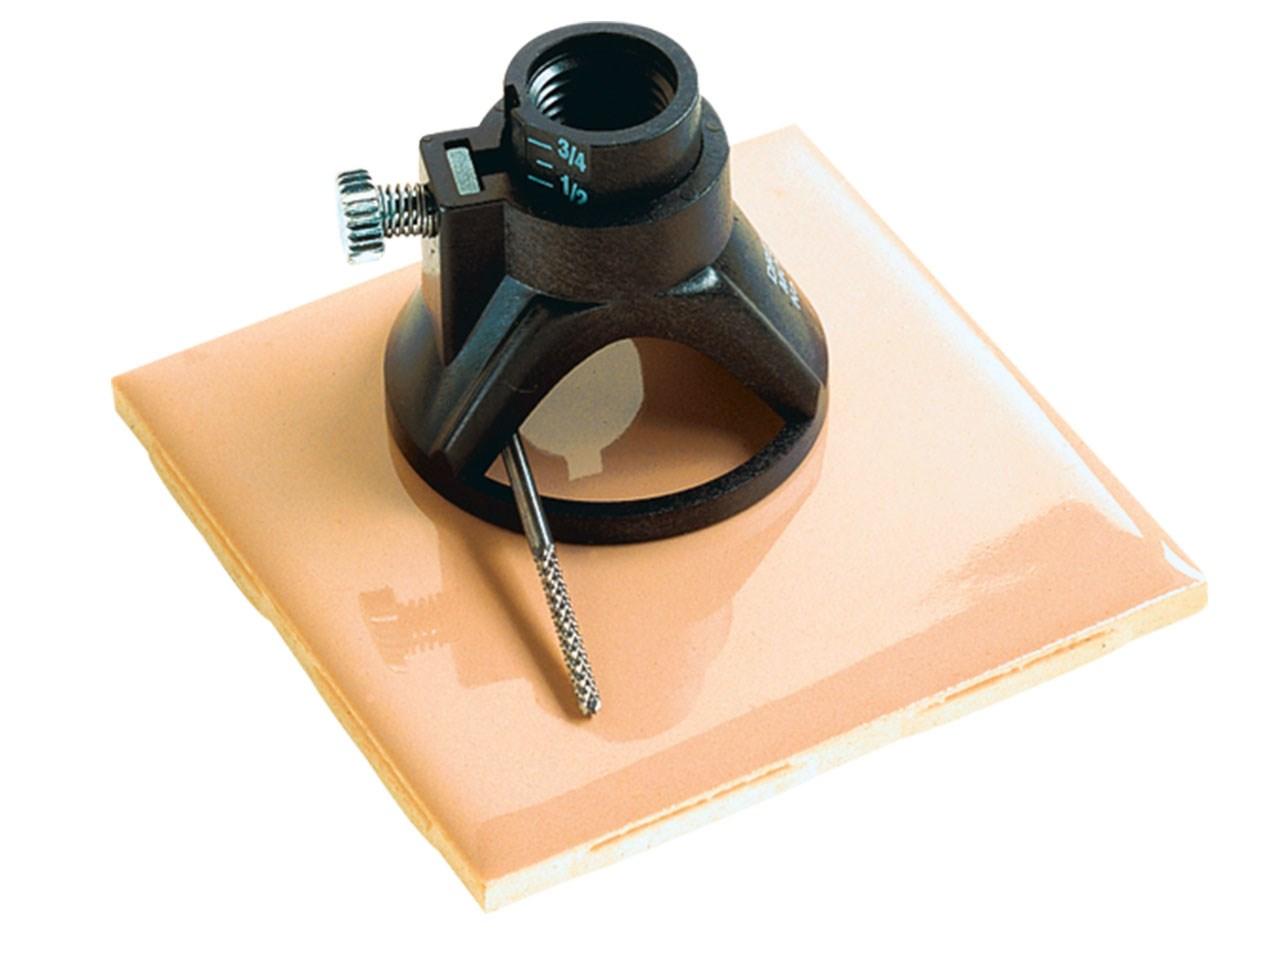 Dremel 566 Ceramic Wall Tile Cutting Kit